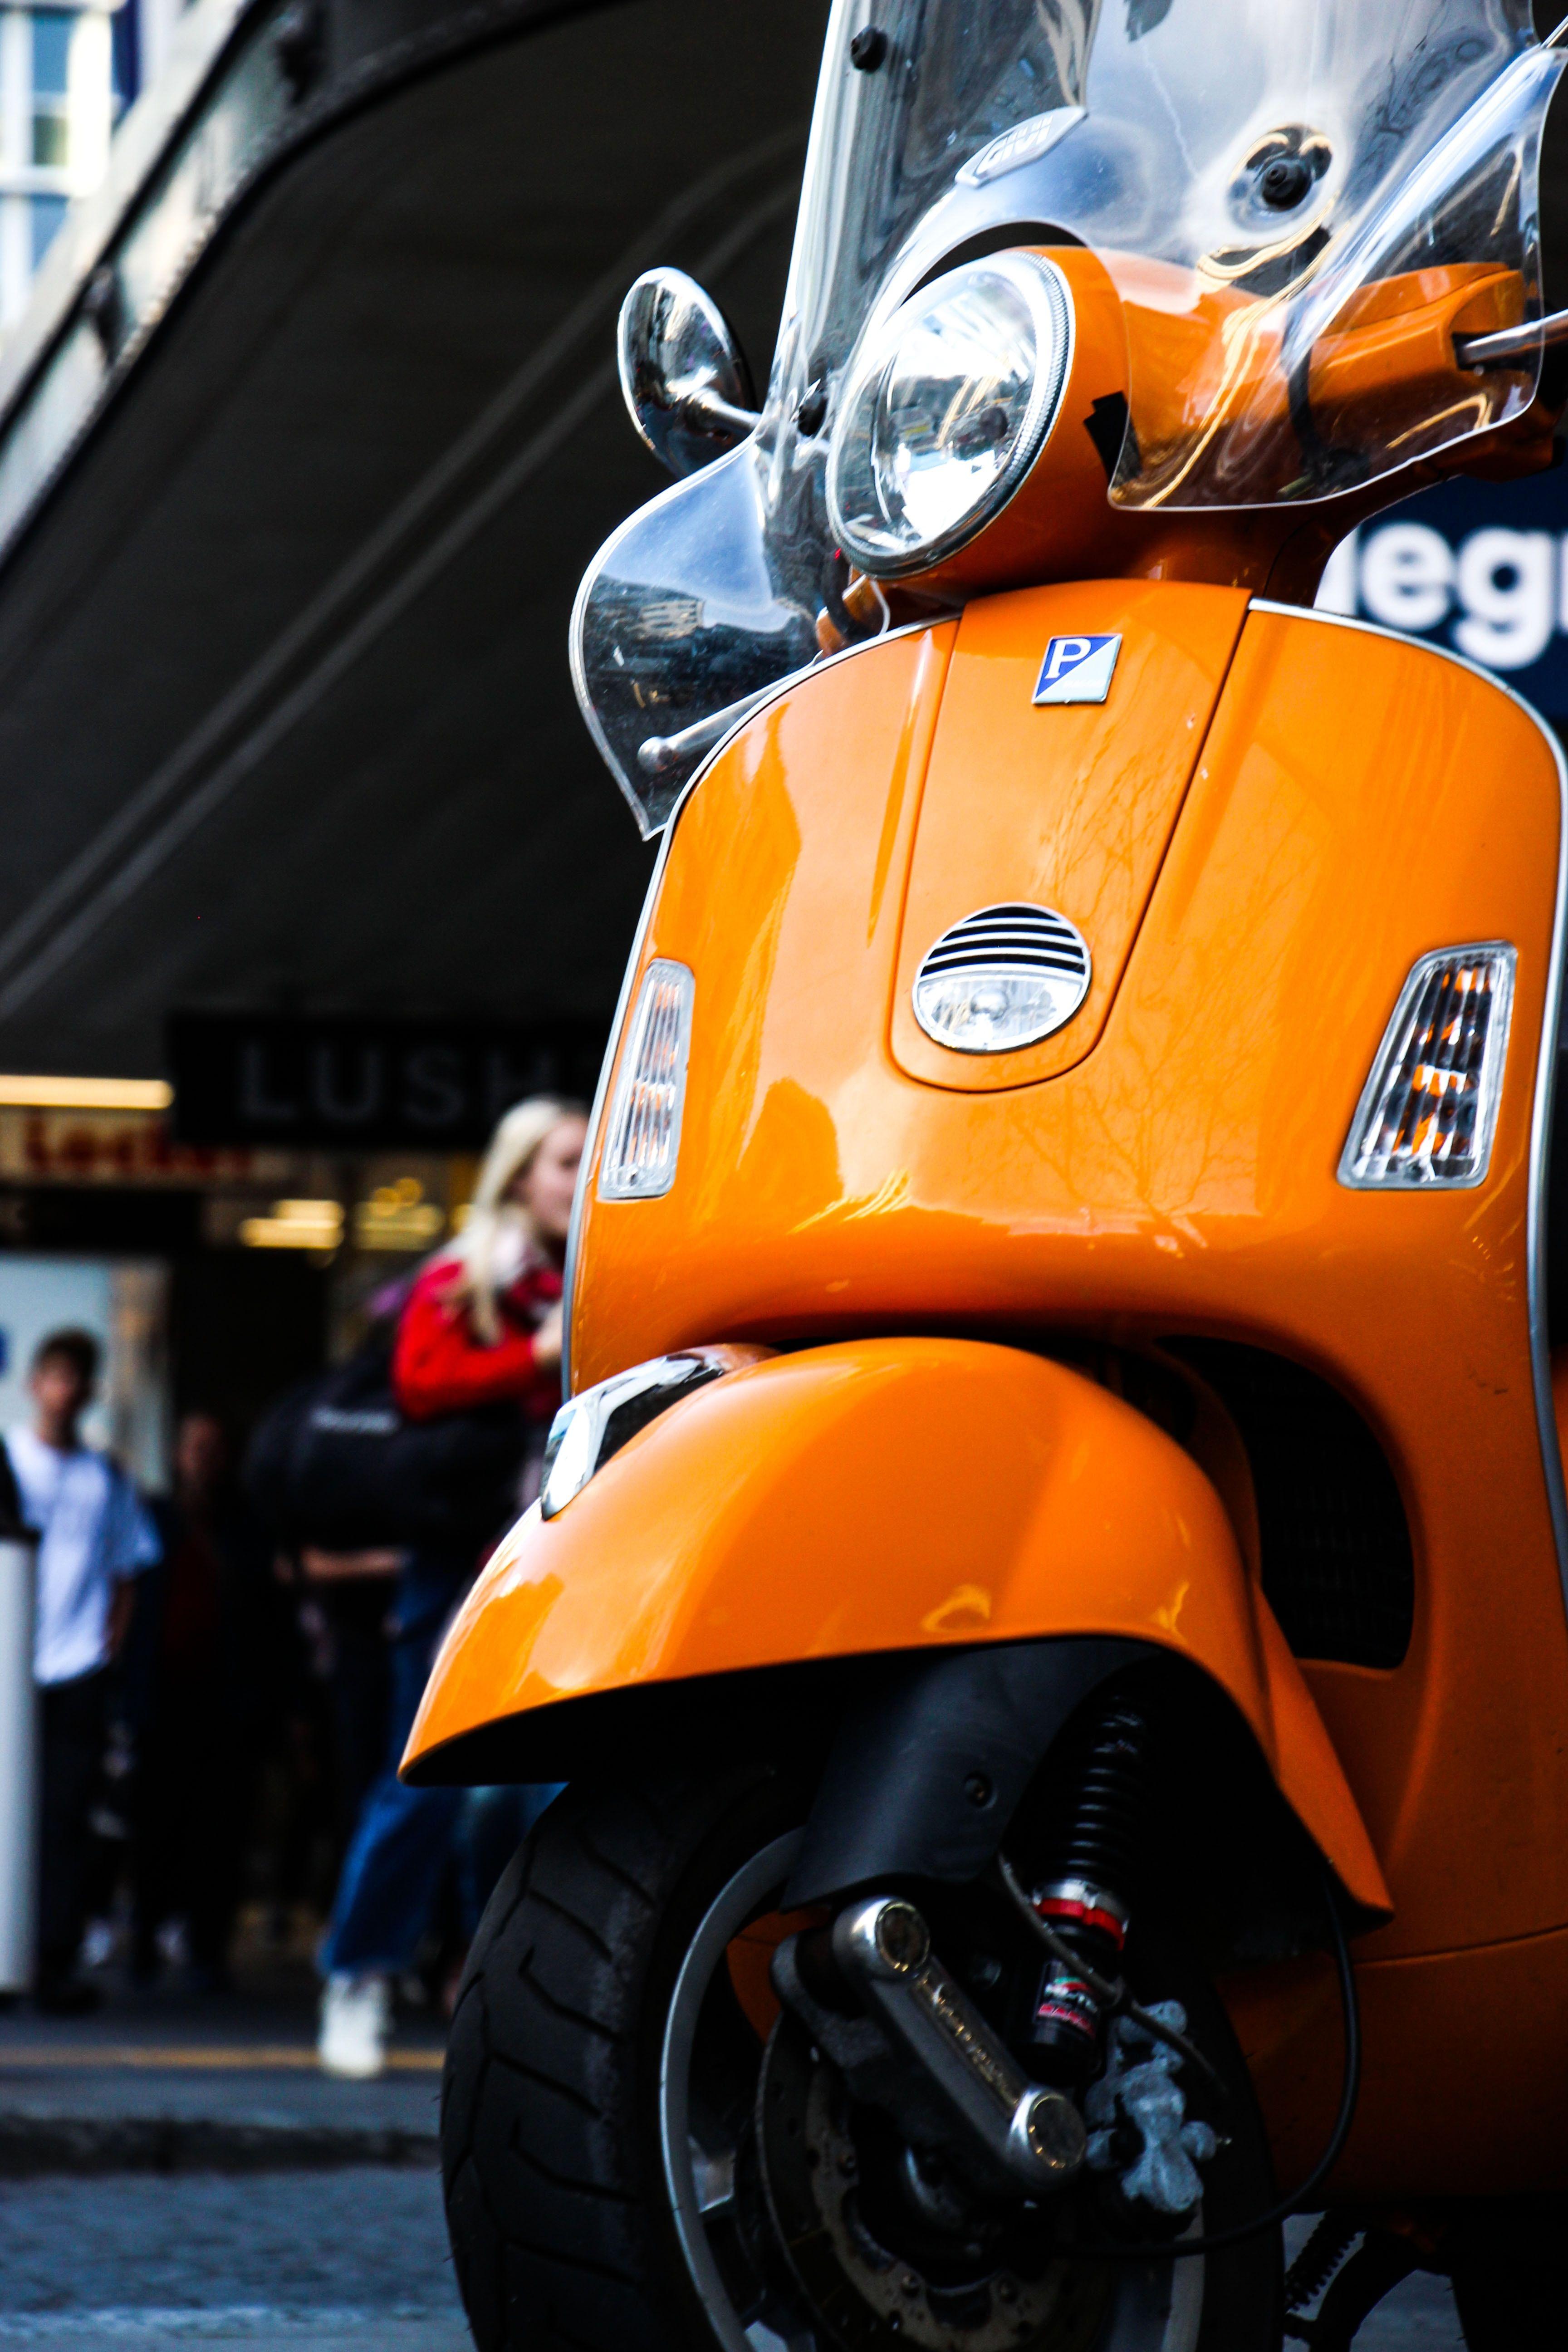 Pin by Ditmir Ulqinaku on Motorcycle Harley davidson